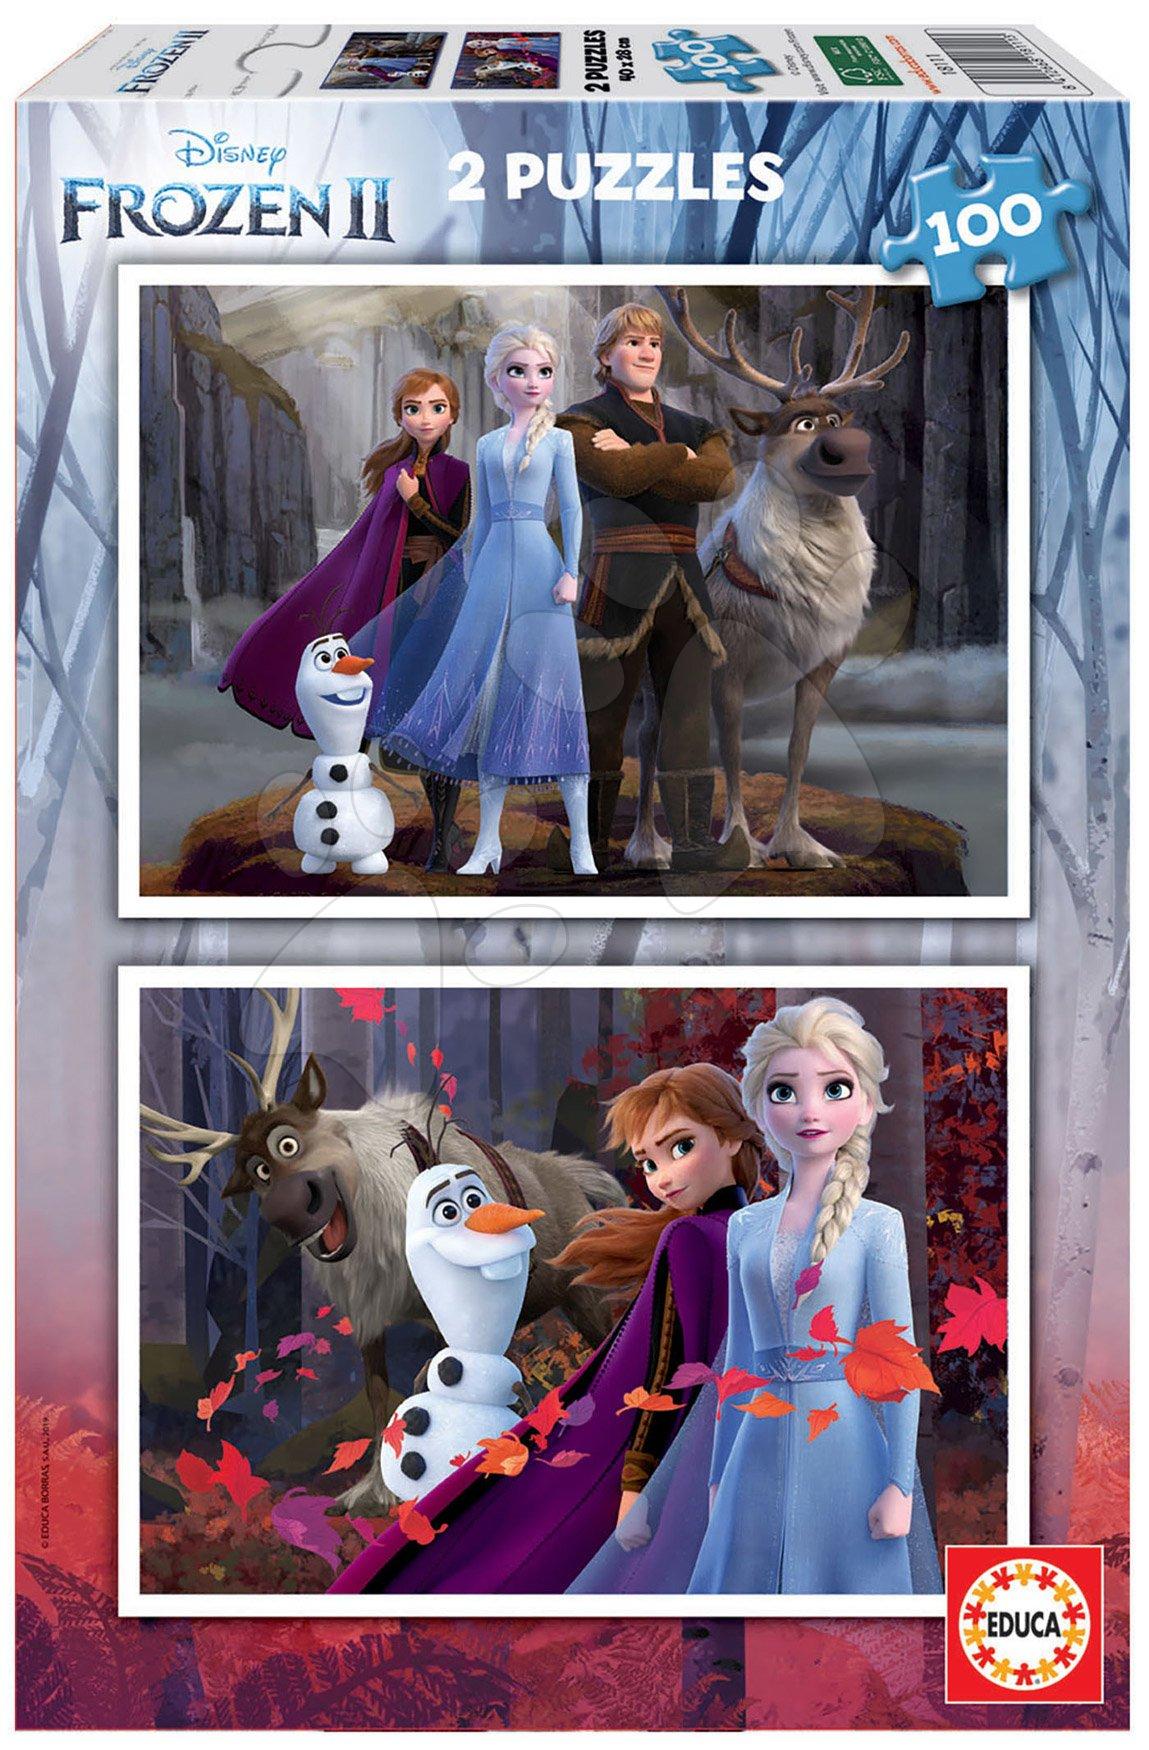 Puzzle Frozen 2 Disney Educa 2x100 dielov od 6 rokov